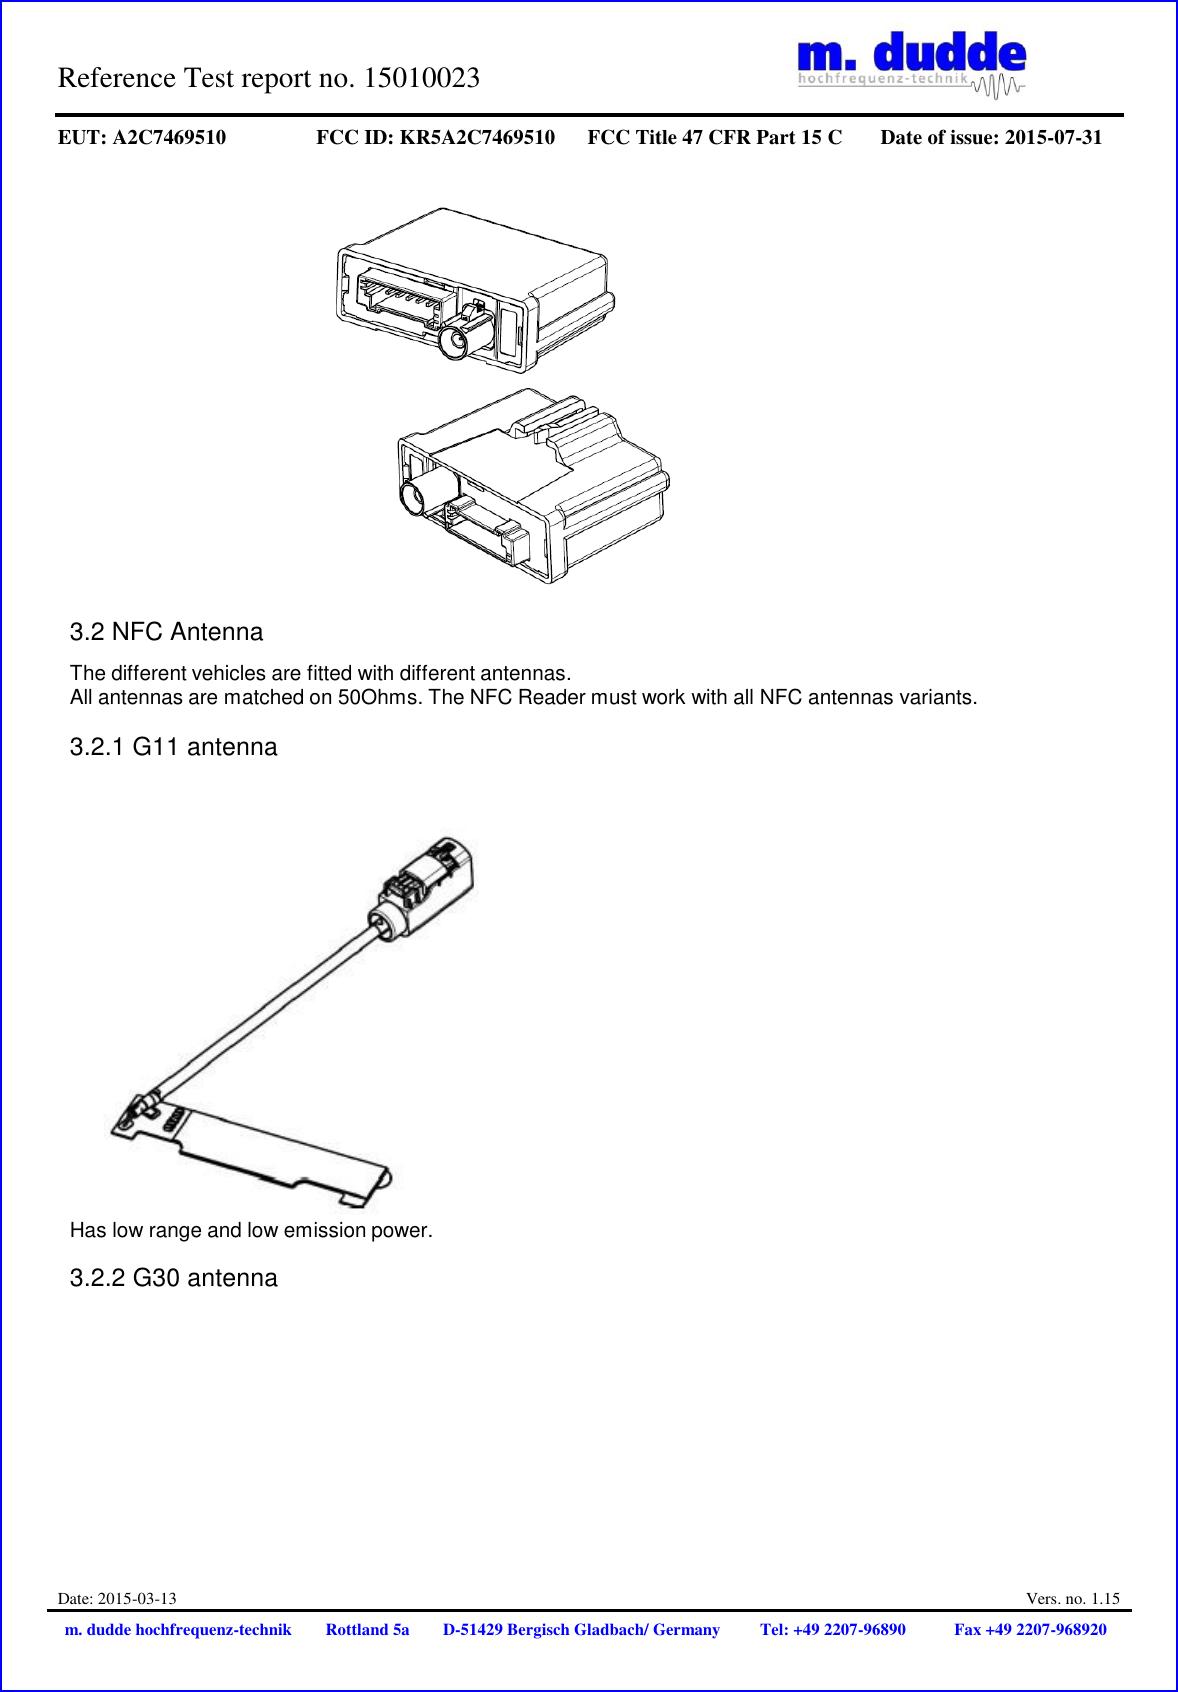 Continental Automotive A2C7469510 NFC Reader User Manual